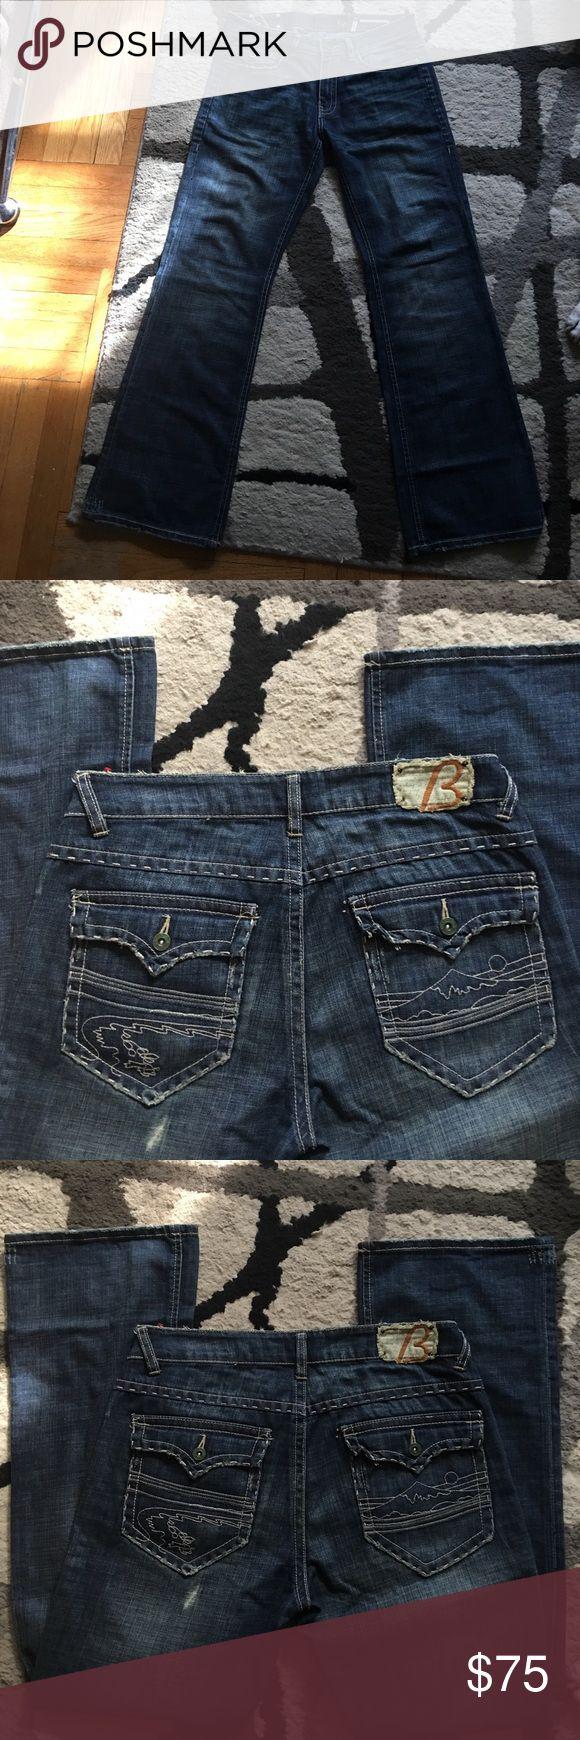 ⏳MENS buffalo jeans like new Absolutely no flaws Buffalo David Bitton Jeans